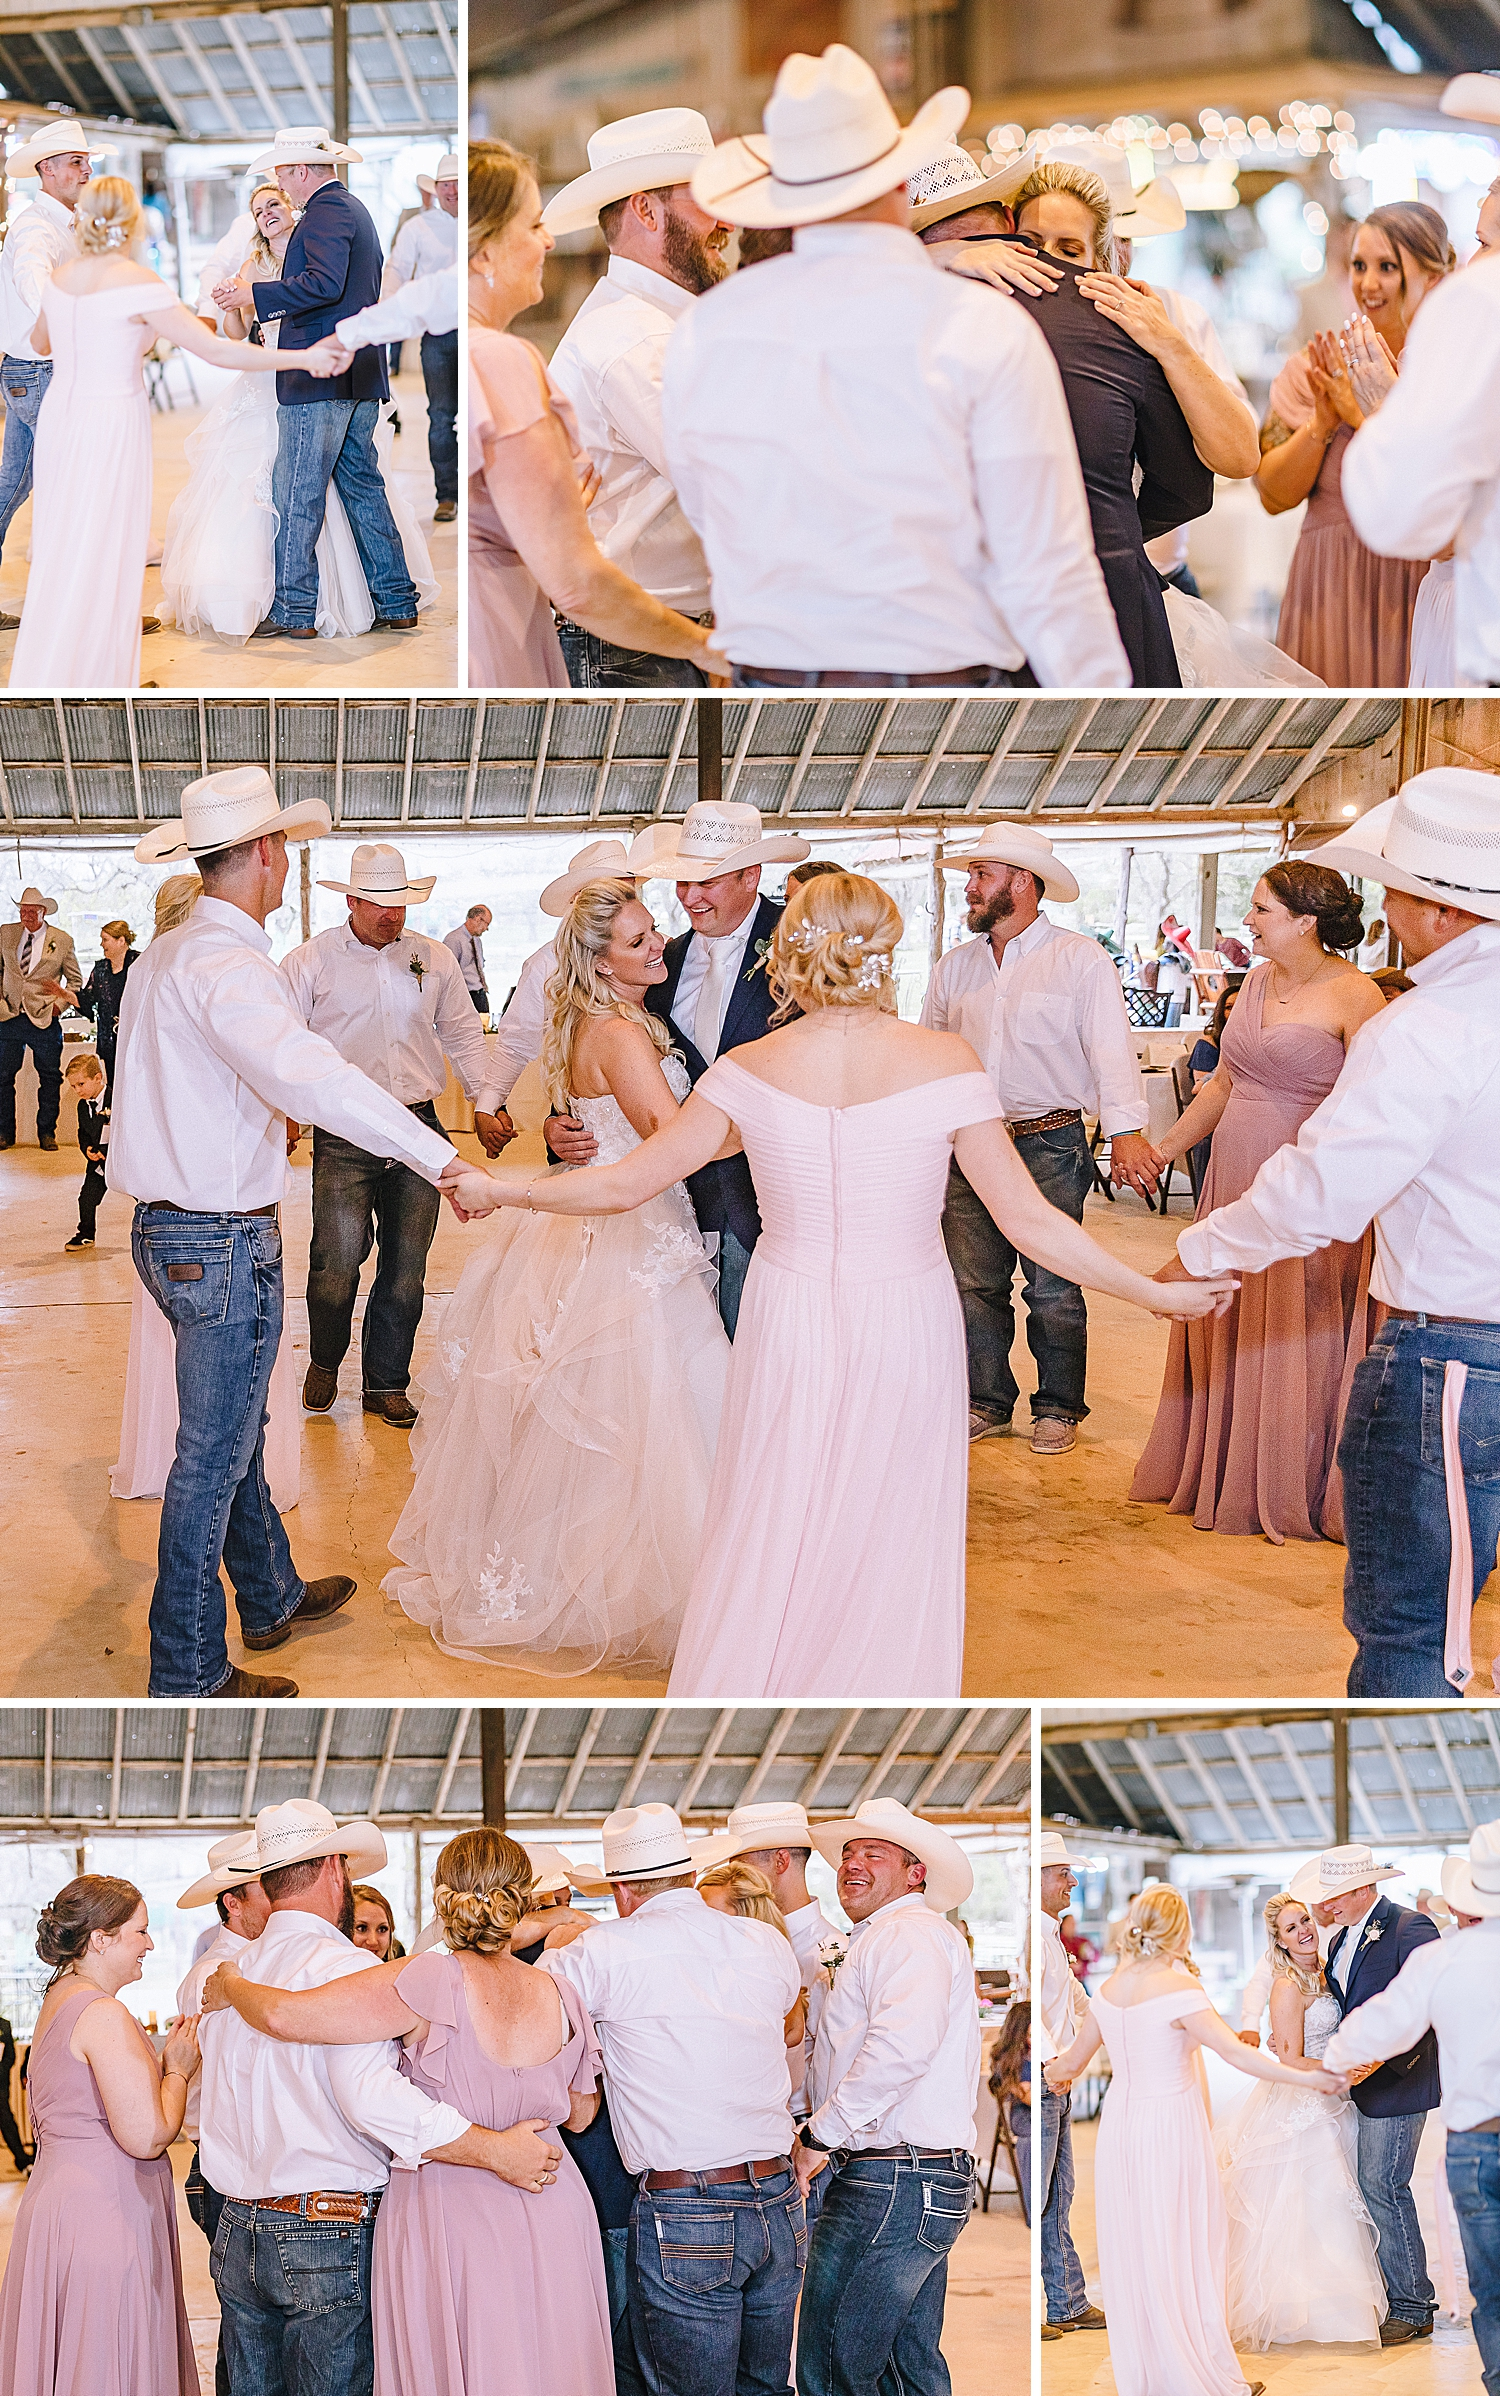 Rio-Cibilo-Ranch-Marion-Texas-Wedding-Rustic-Blush-Rose-Quartz-Details-Carly-Barton-Photography_0077.jpg